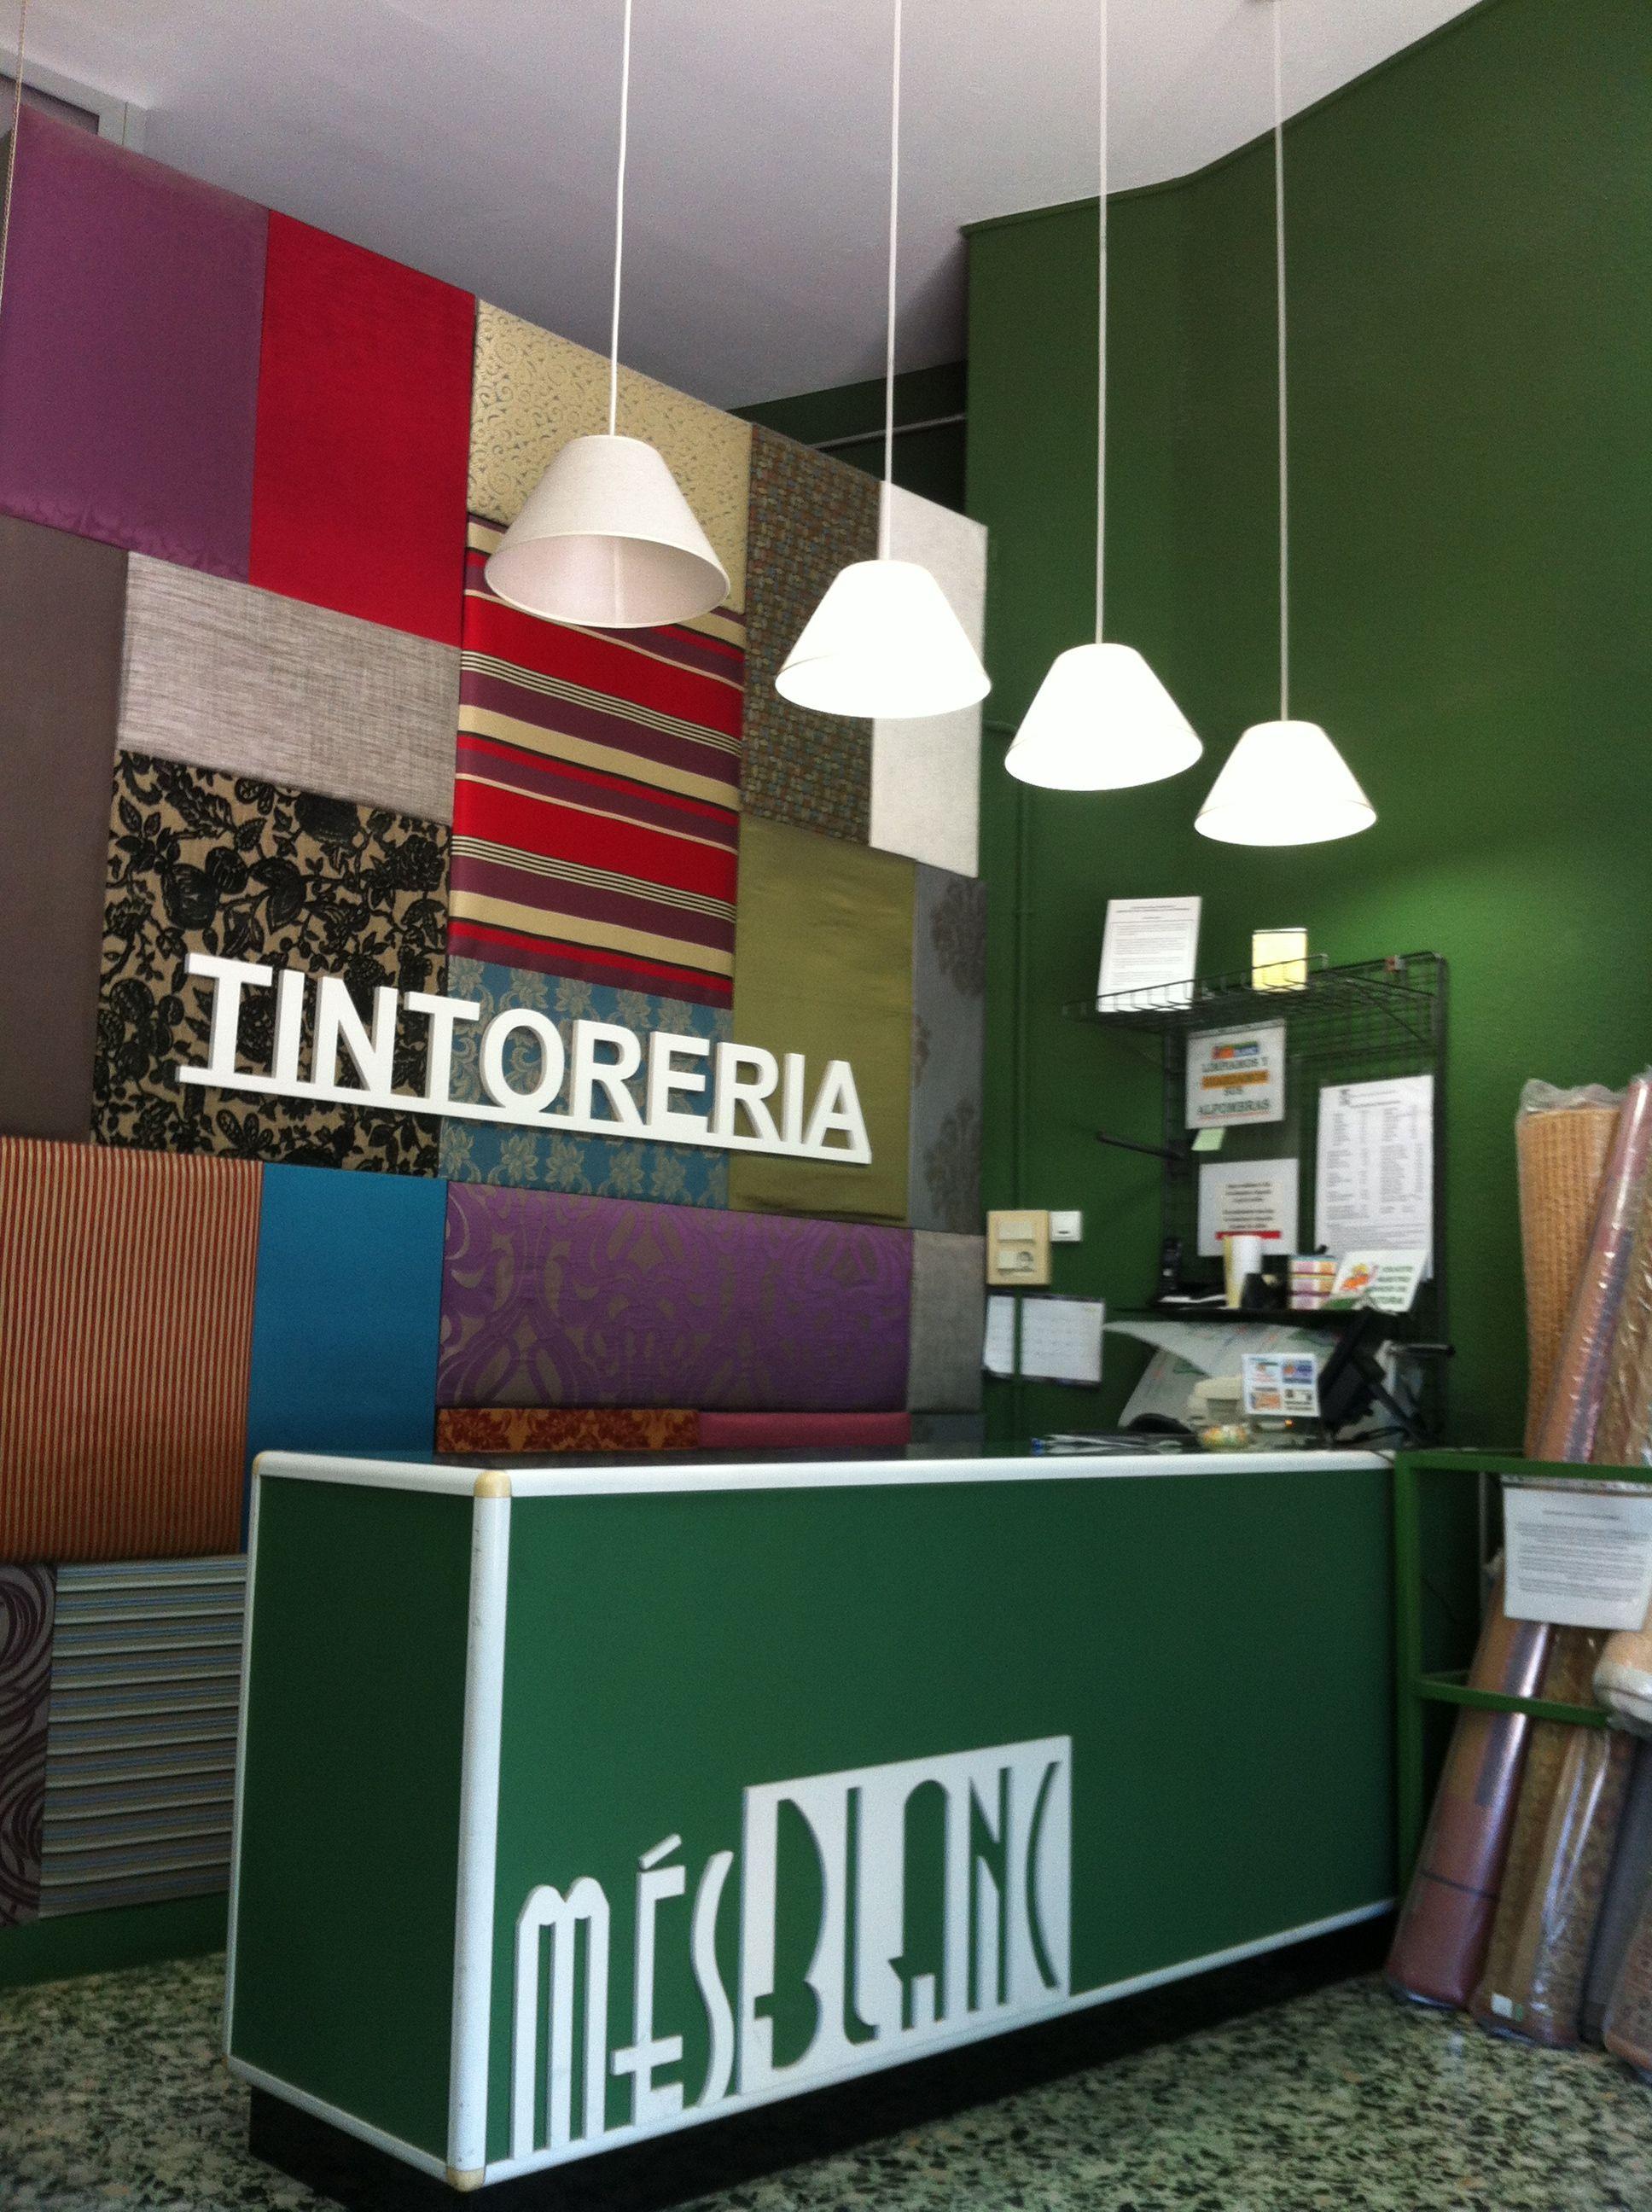 Tintorer A M Sblanc Servicios Limpieza Hogar Y Profesional Tu  # Muebles Gema Bogota